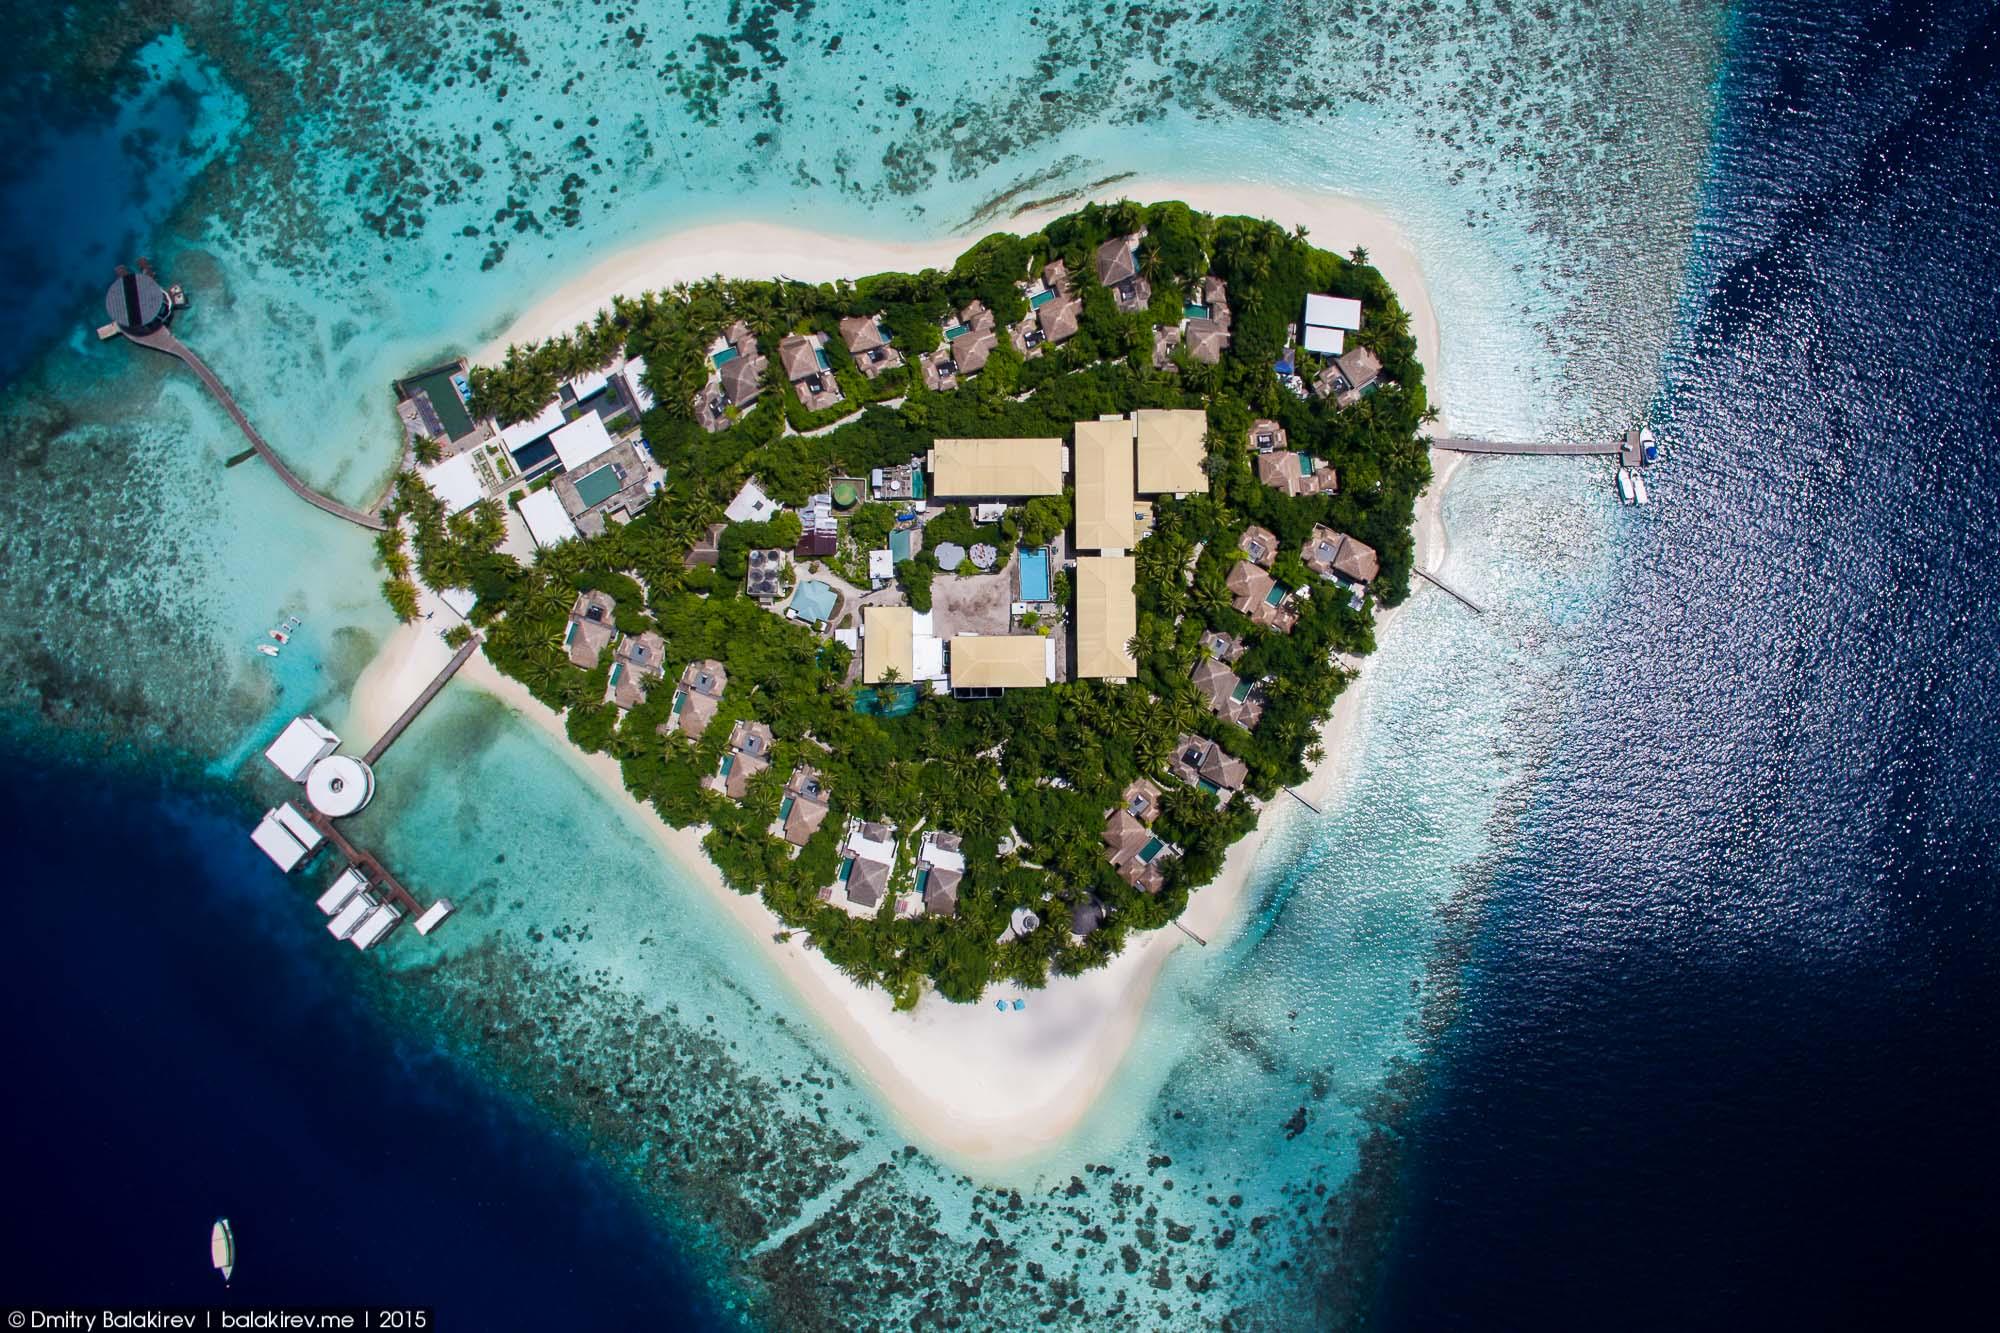 фото остров в виде сердца